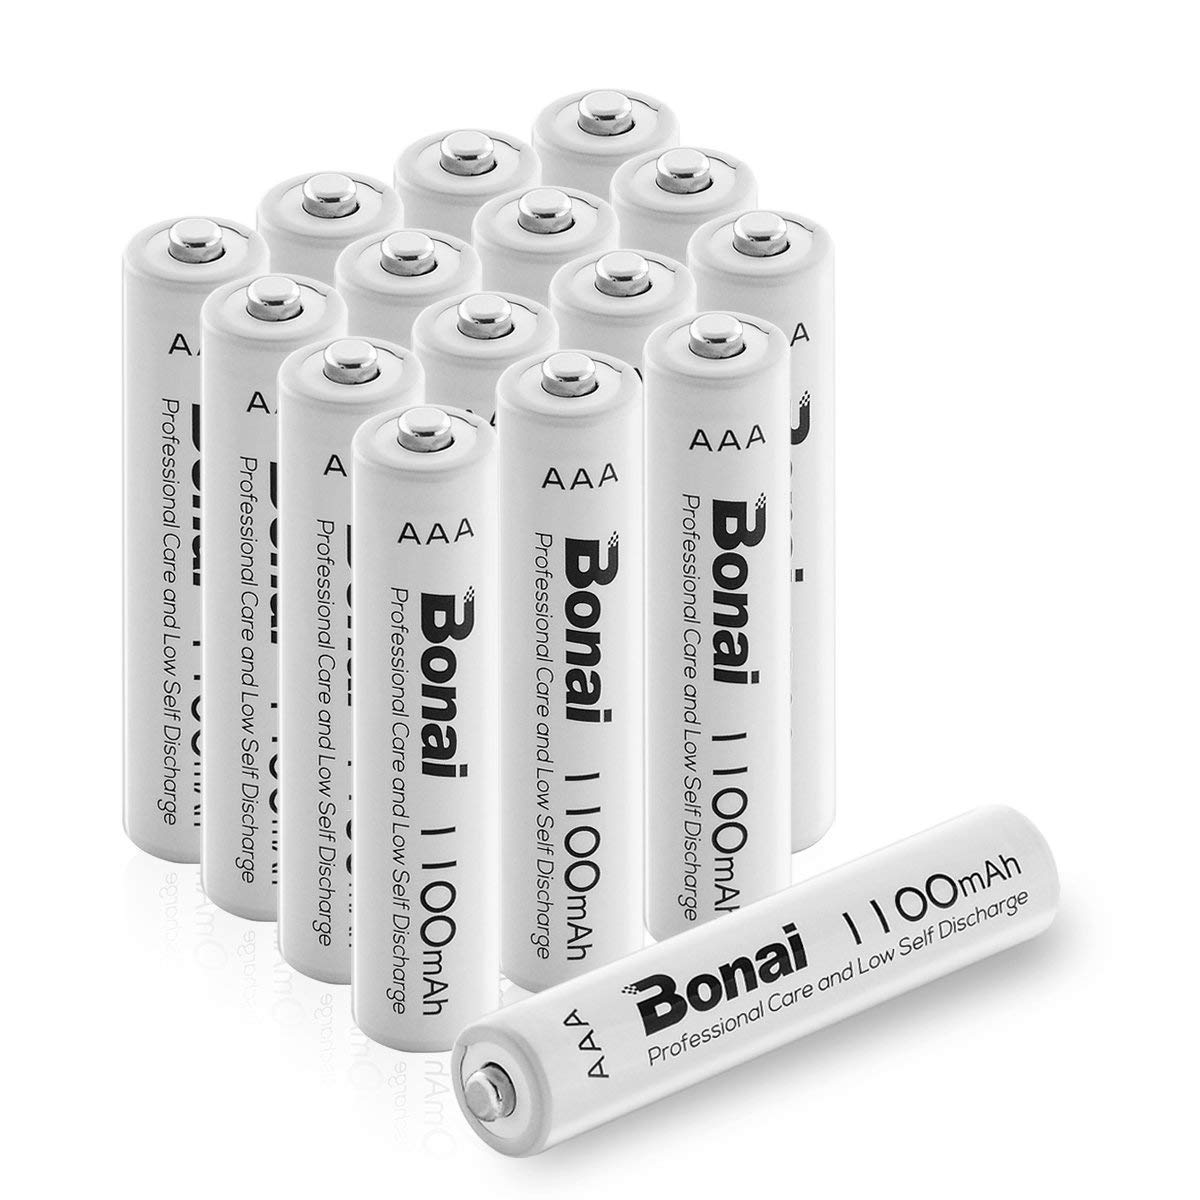 BONAI 1100mAh AAA Rechargeable Batteries 1.2V Ni-MH High-Capacity Batteries 16 Pack - UL Certificate